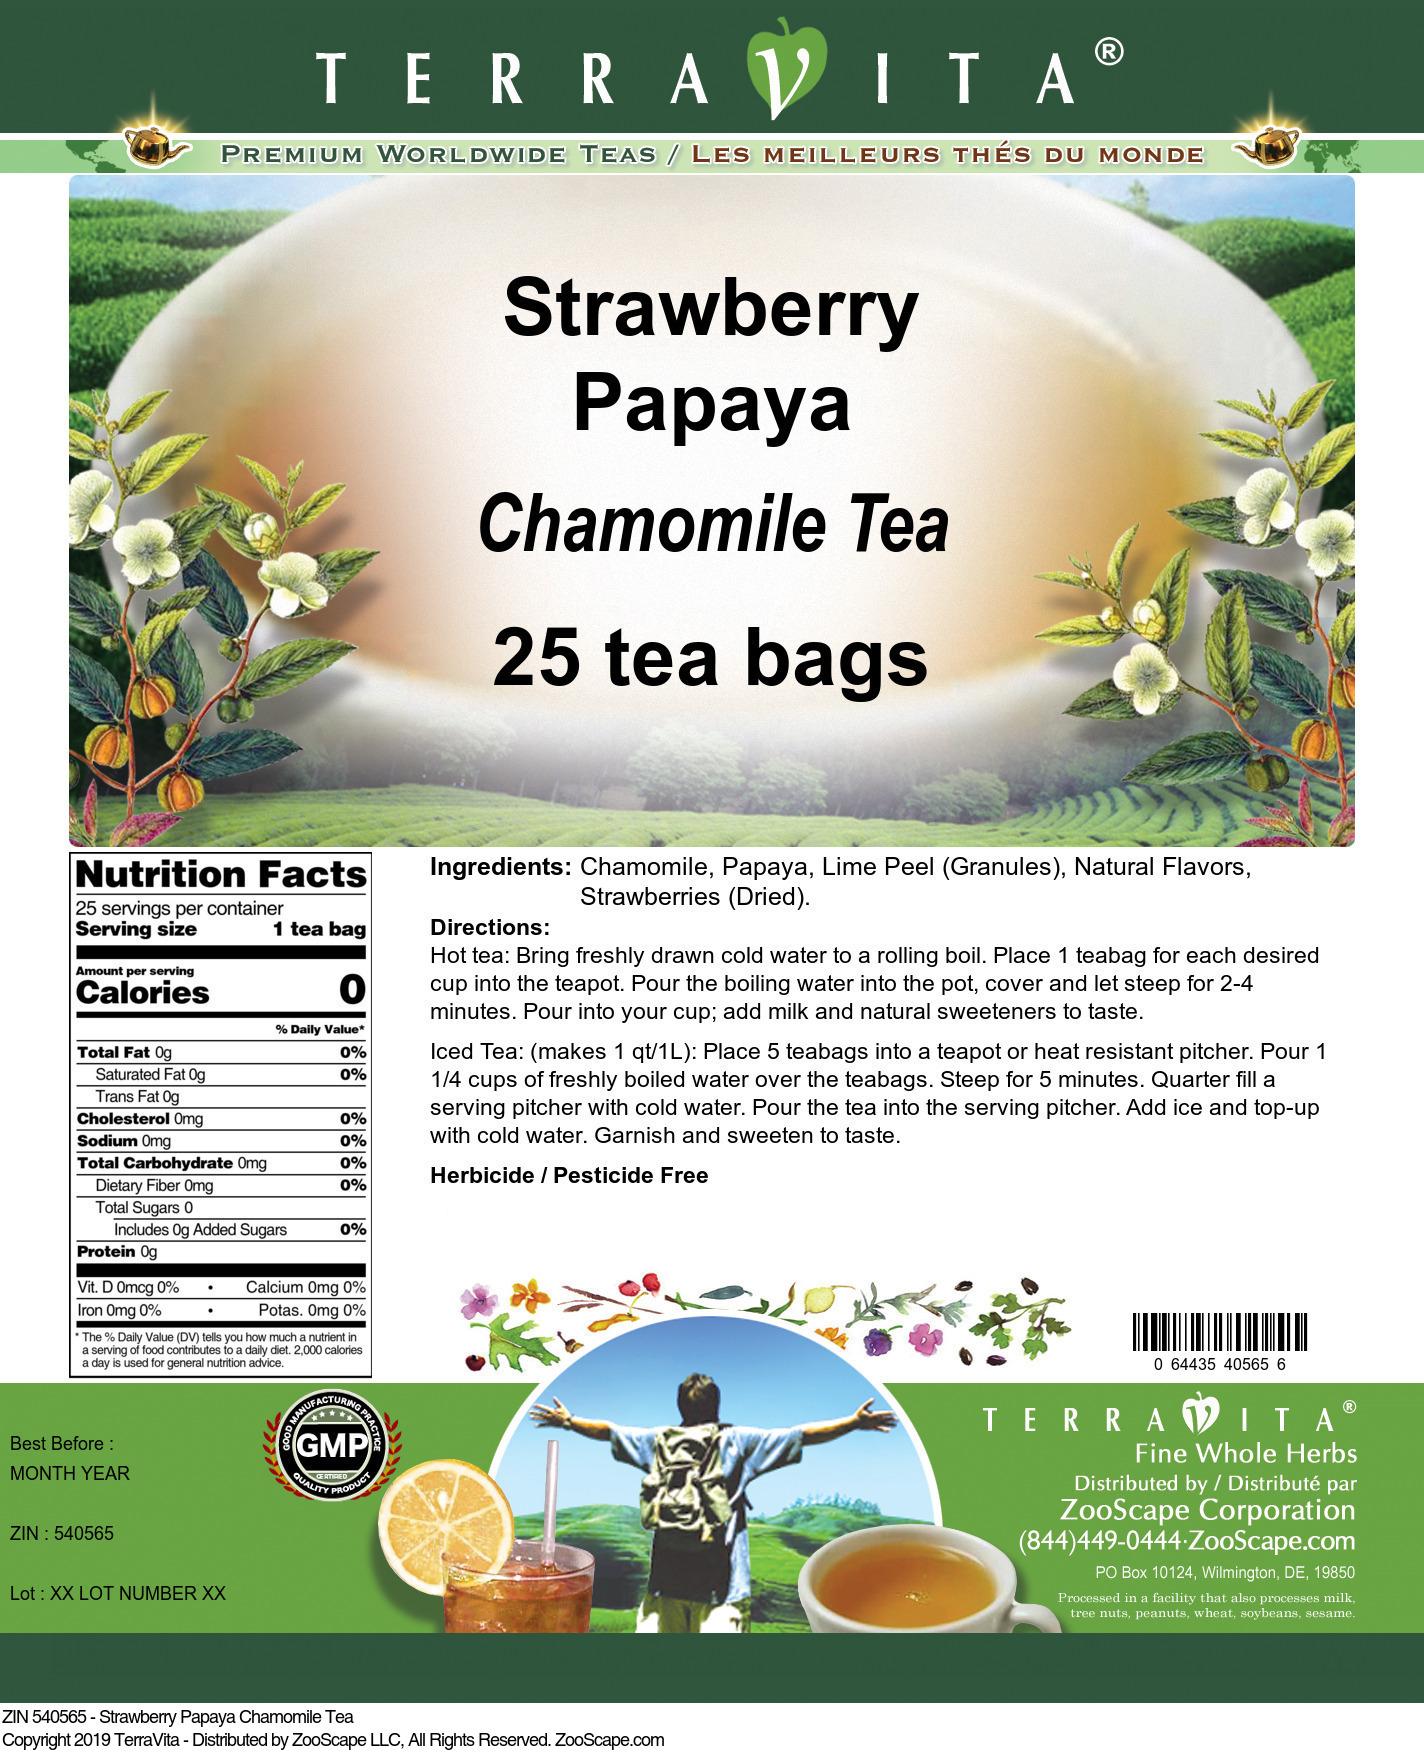 Strawberry Papaya Chamomile Tea